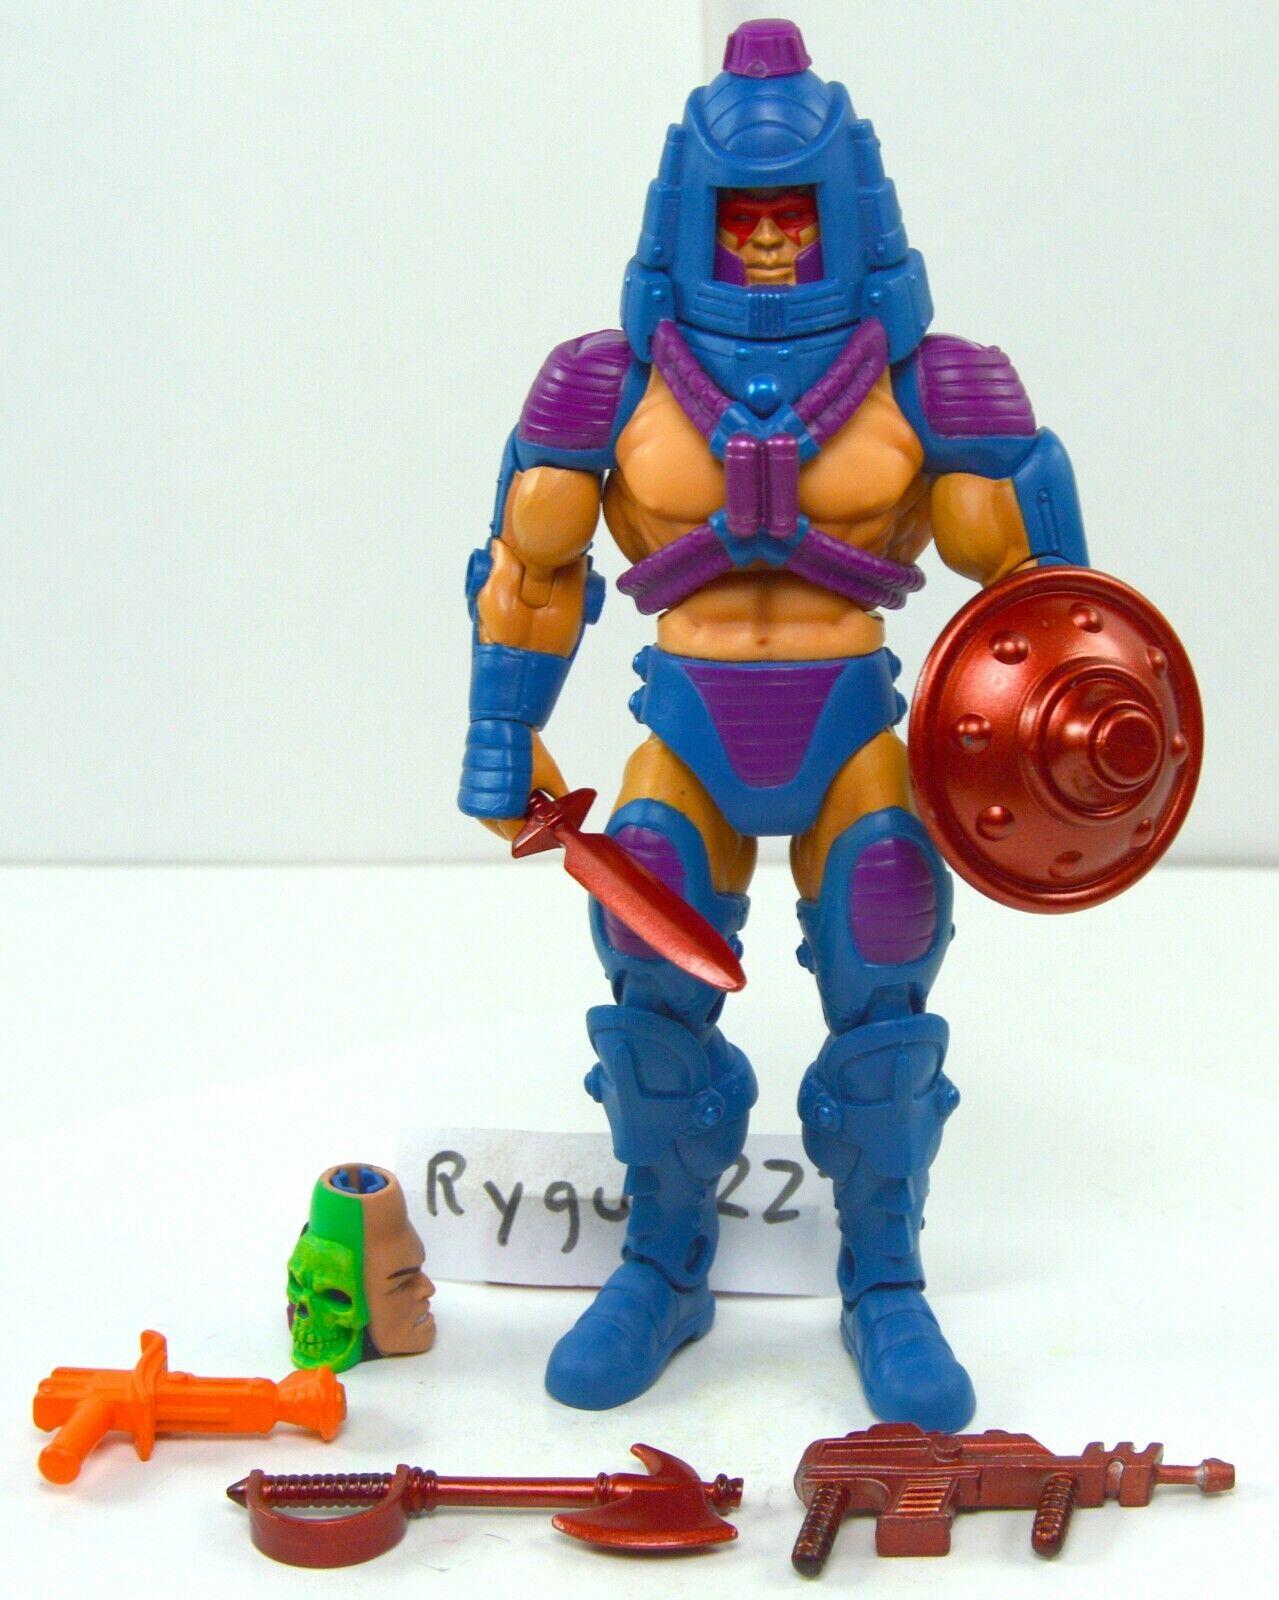 Motuc, hombre-e-Cocheas, Figura, amos del universo clásicos, Completa, he-man